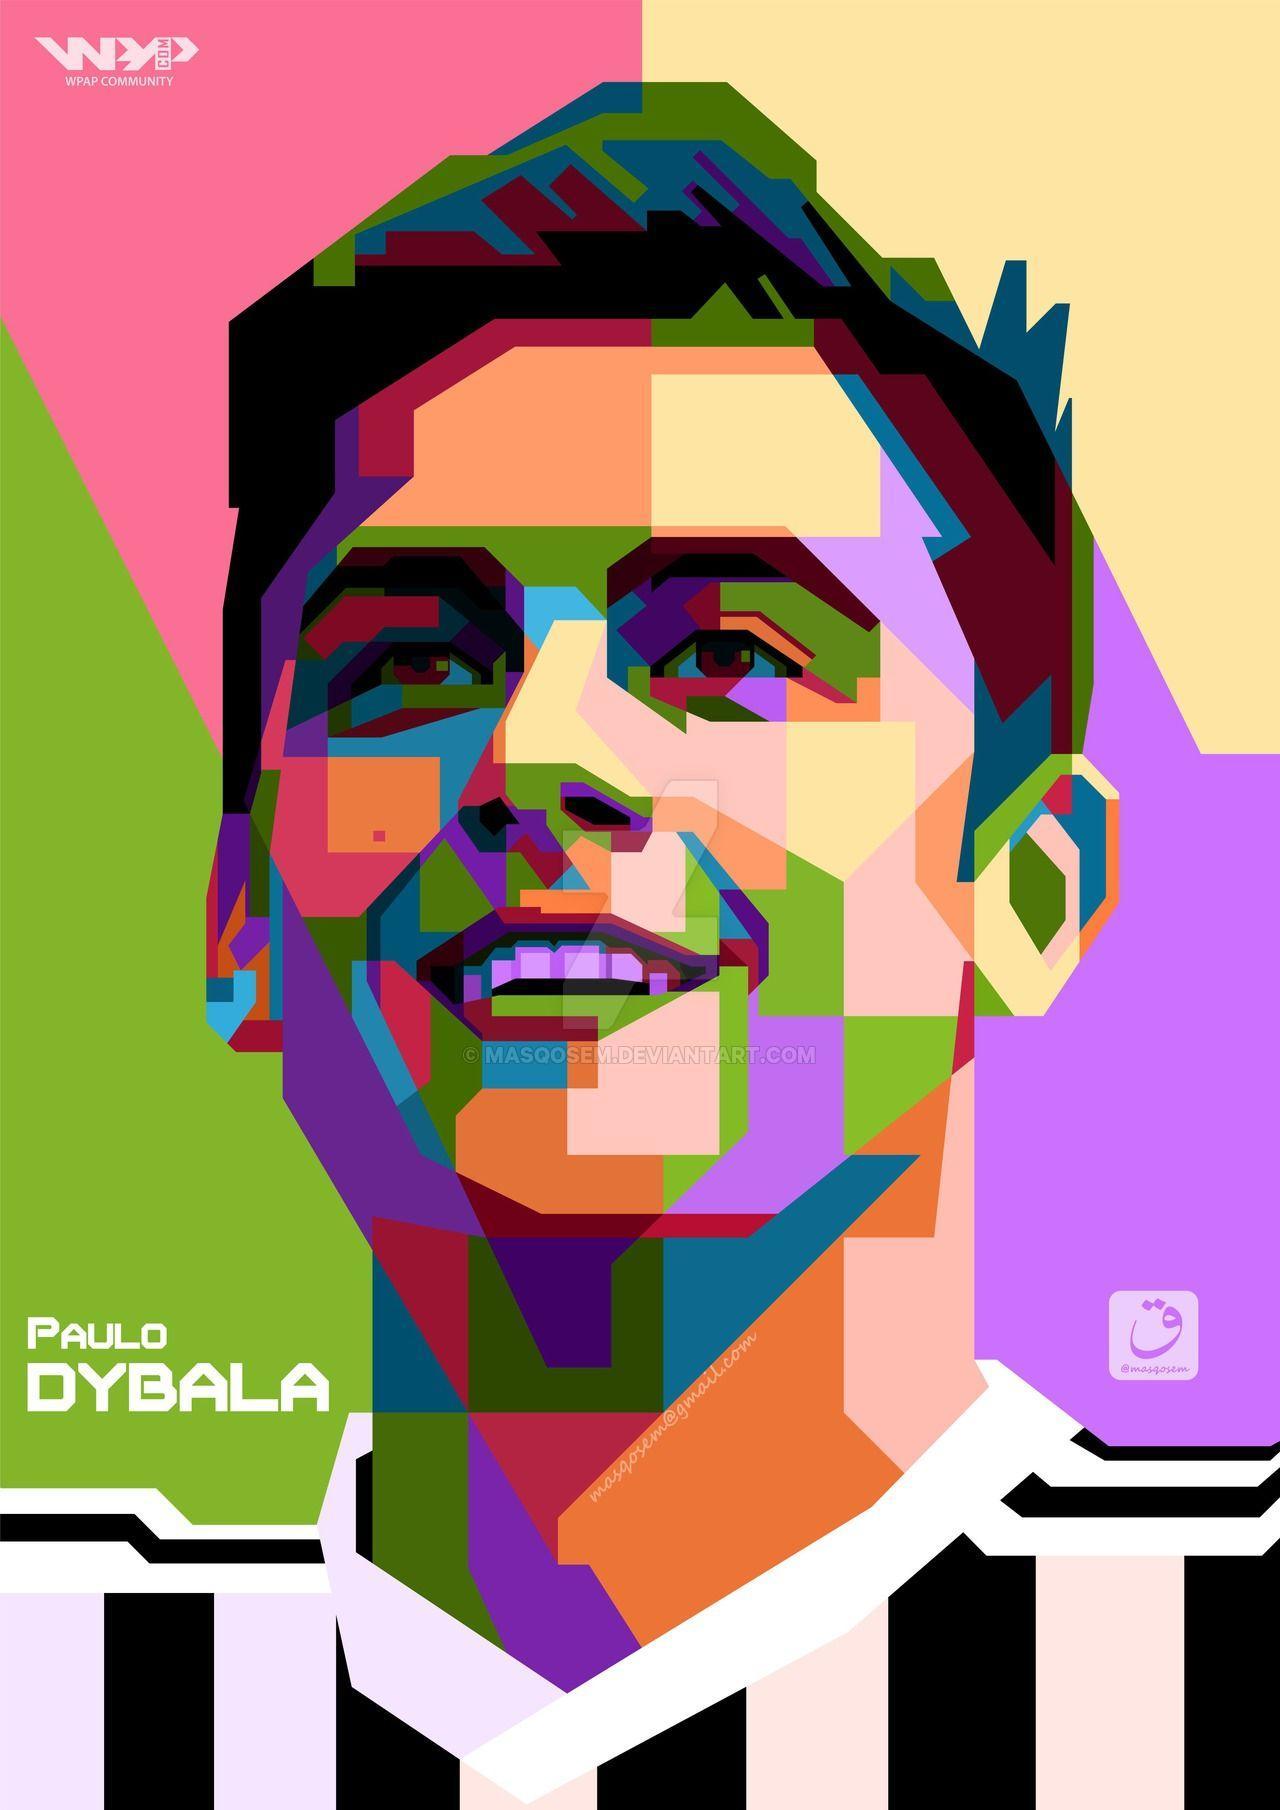 Paulo Dybala Wallpapers - Wallpaper Cave